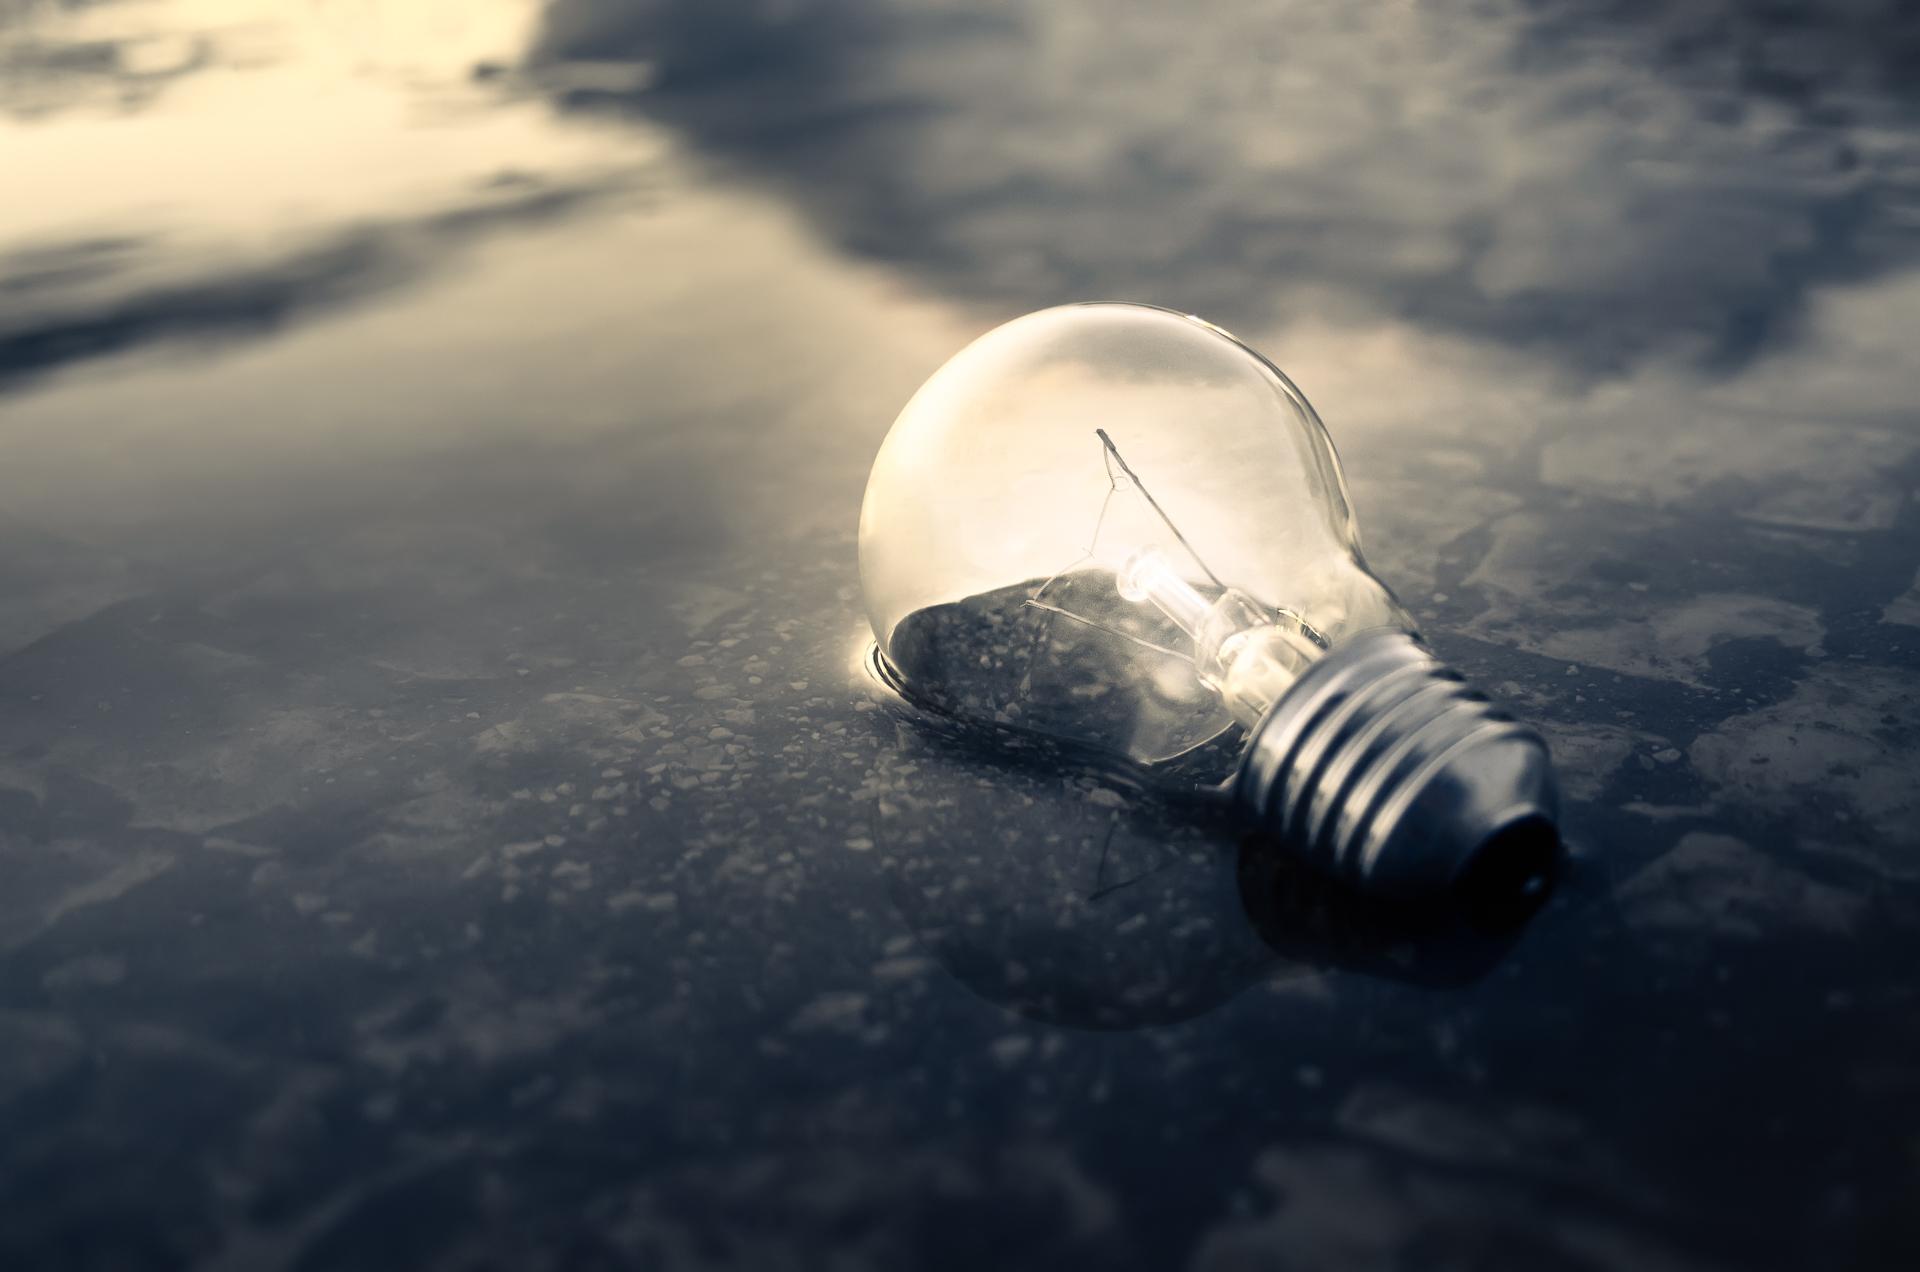 Lost Ideas by insidesignz